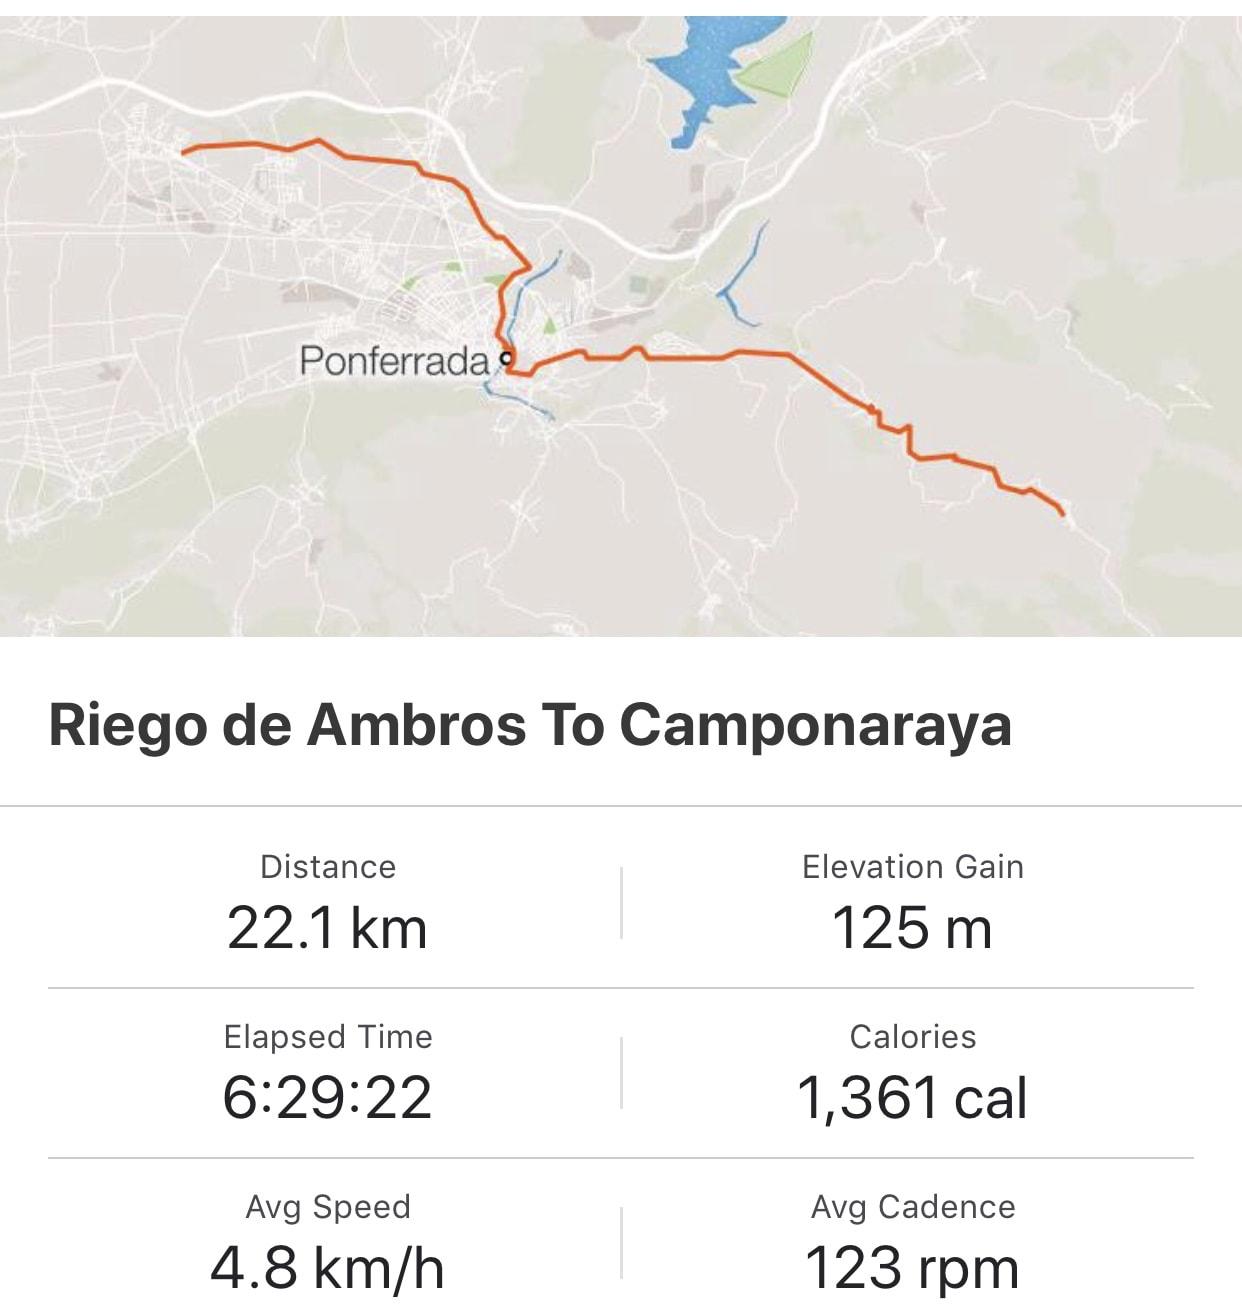 Strava: Riego de Ambros to Camponaraya